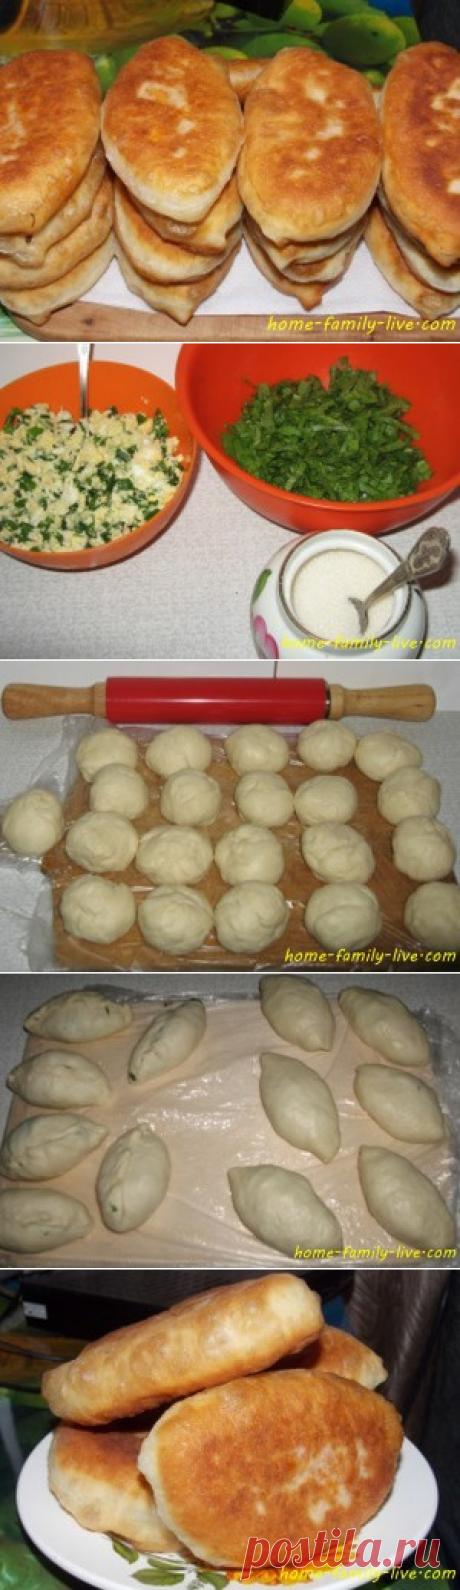 Тесто на пирожки/Сайт с пошаговыми рецептами с фото для тех кто любит готовить